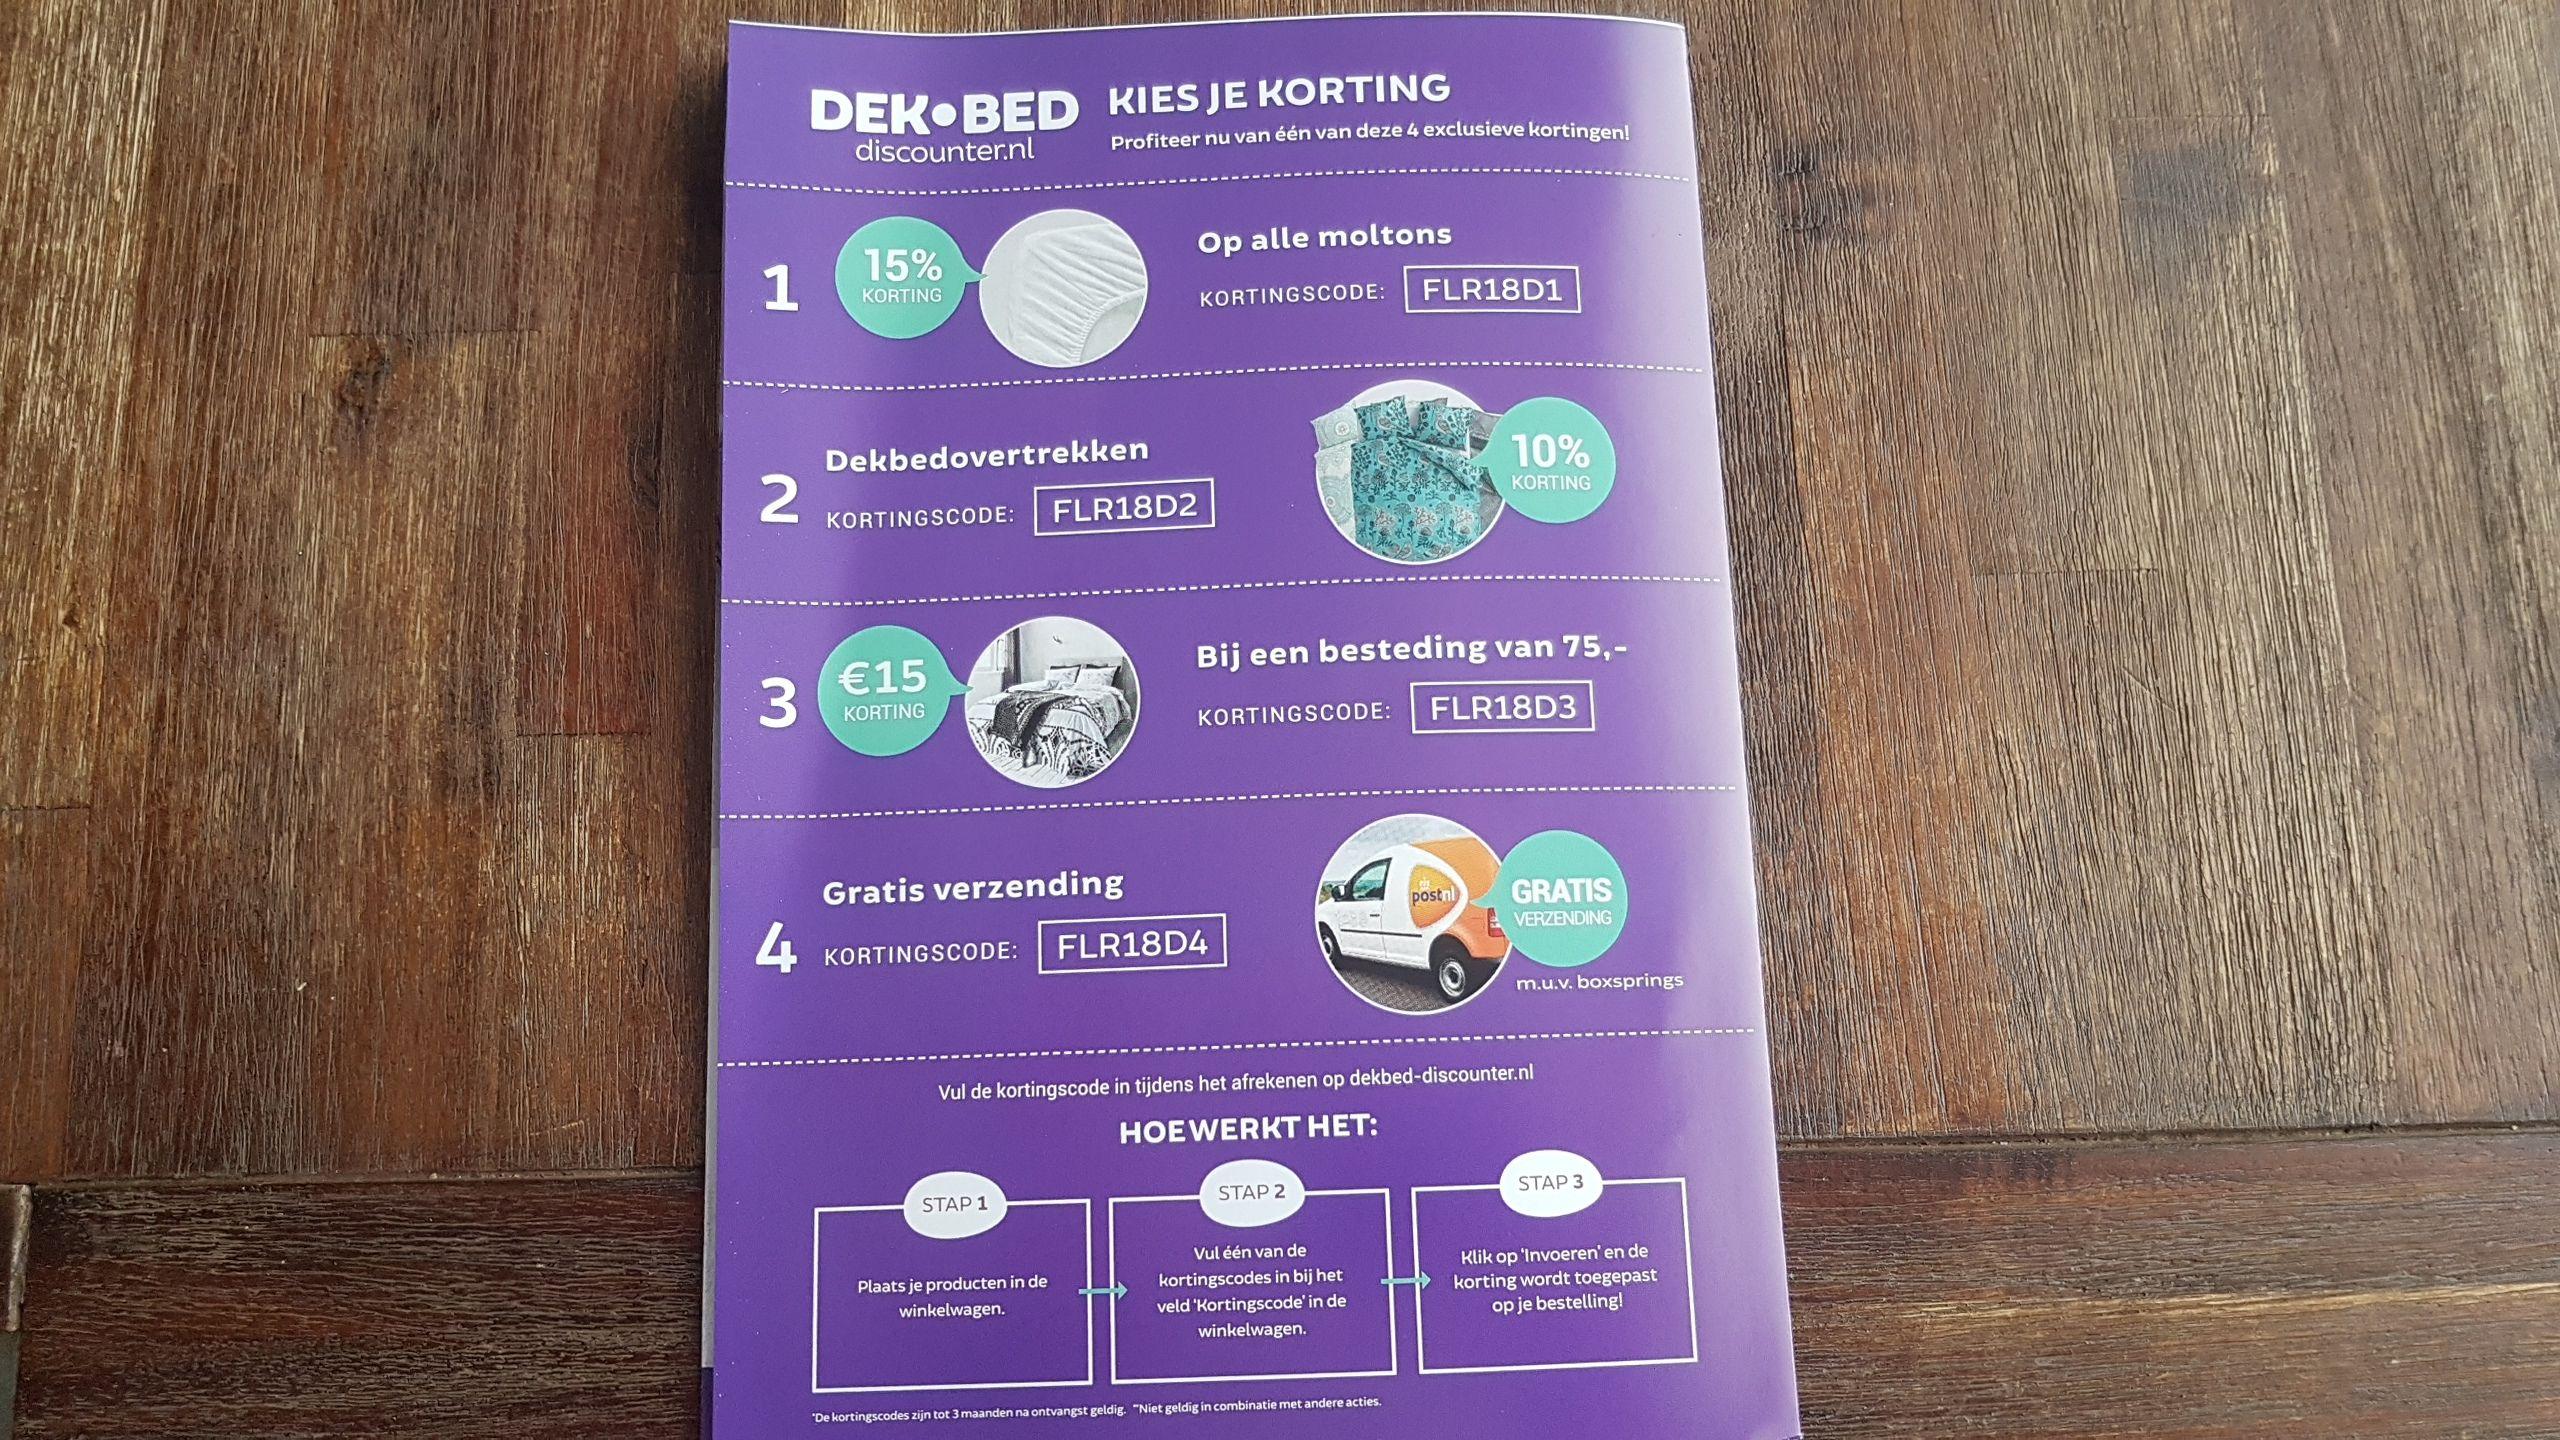 Verschillende kortingscodes Dekbed discounter